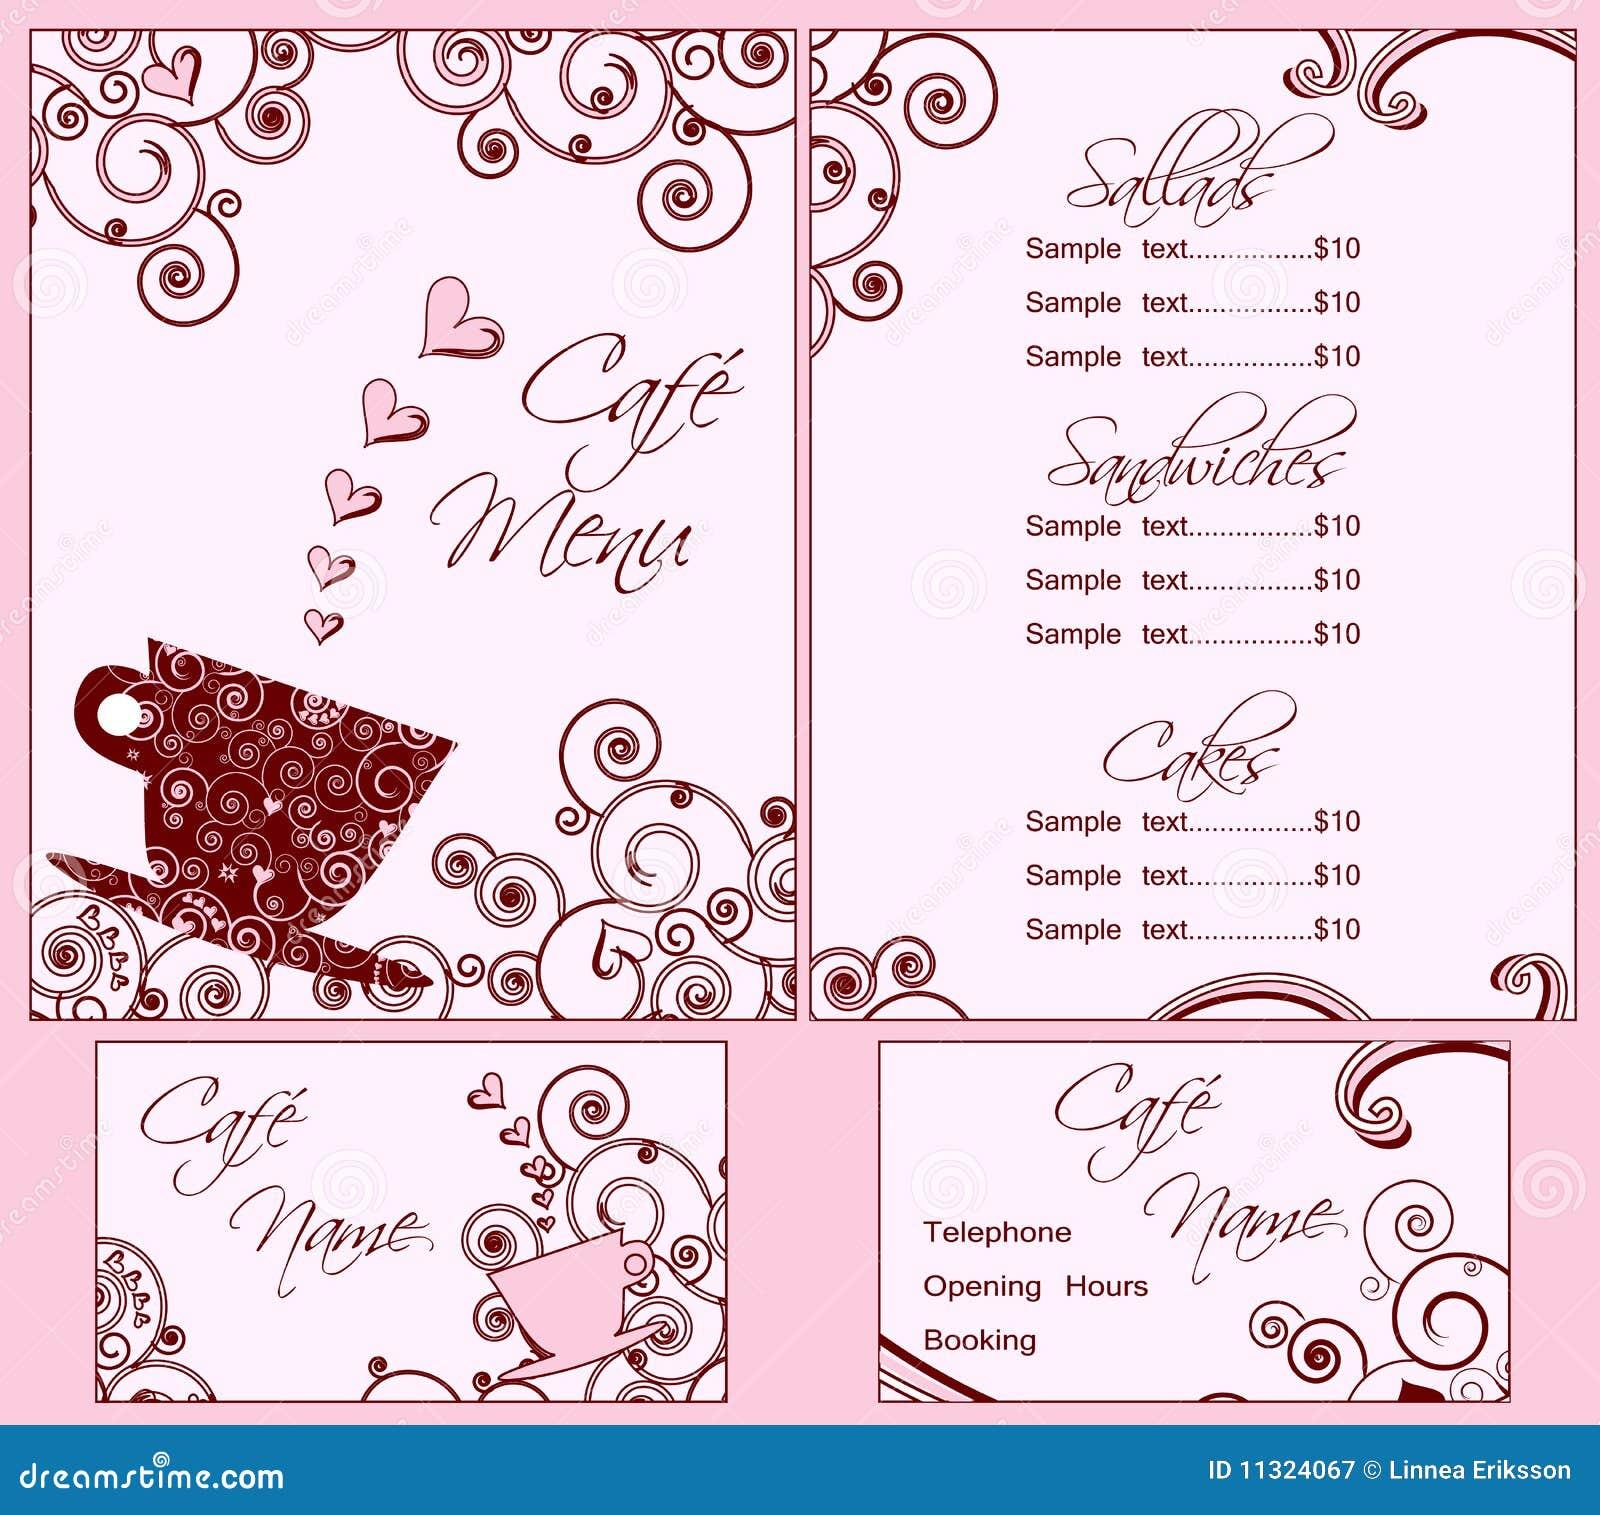 Menu Templates Free Download. Free Menu Card Downloads. View Original U2026  Cafe Menu Templates Free Download